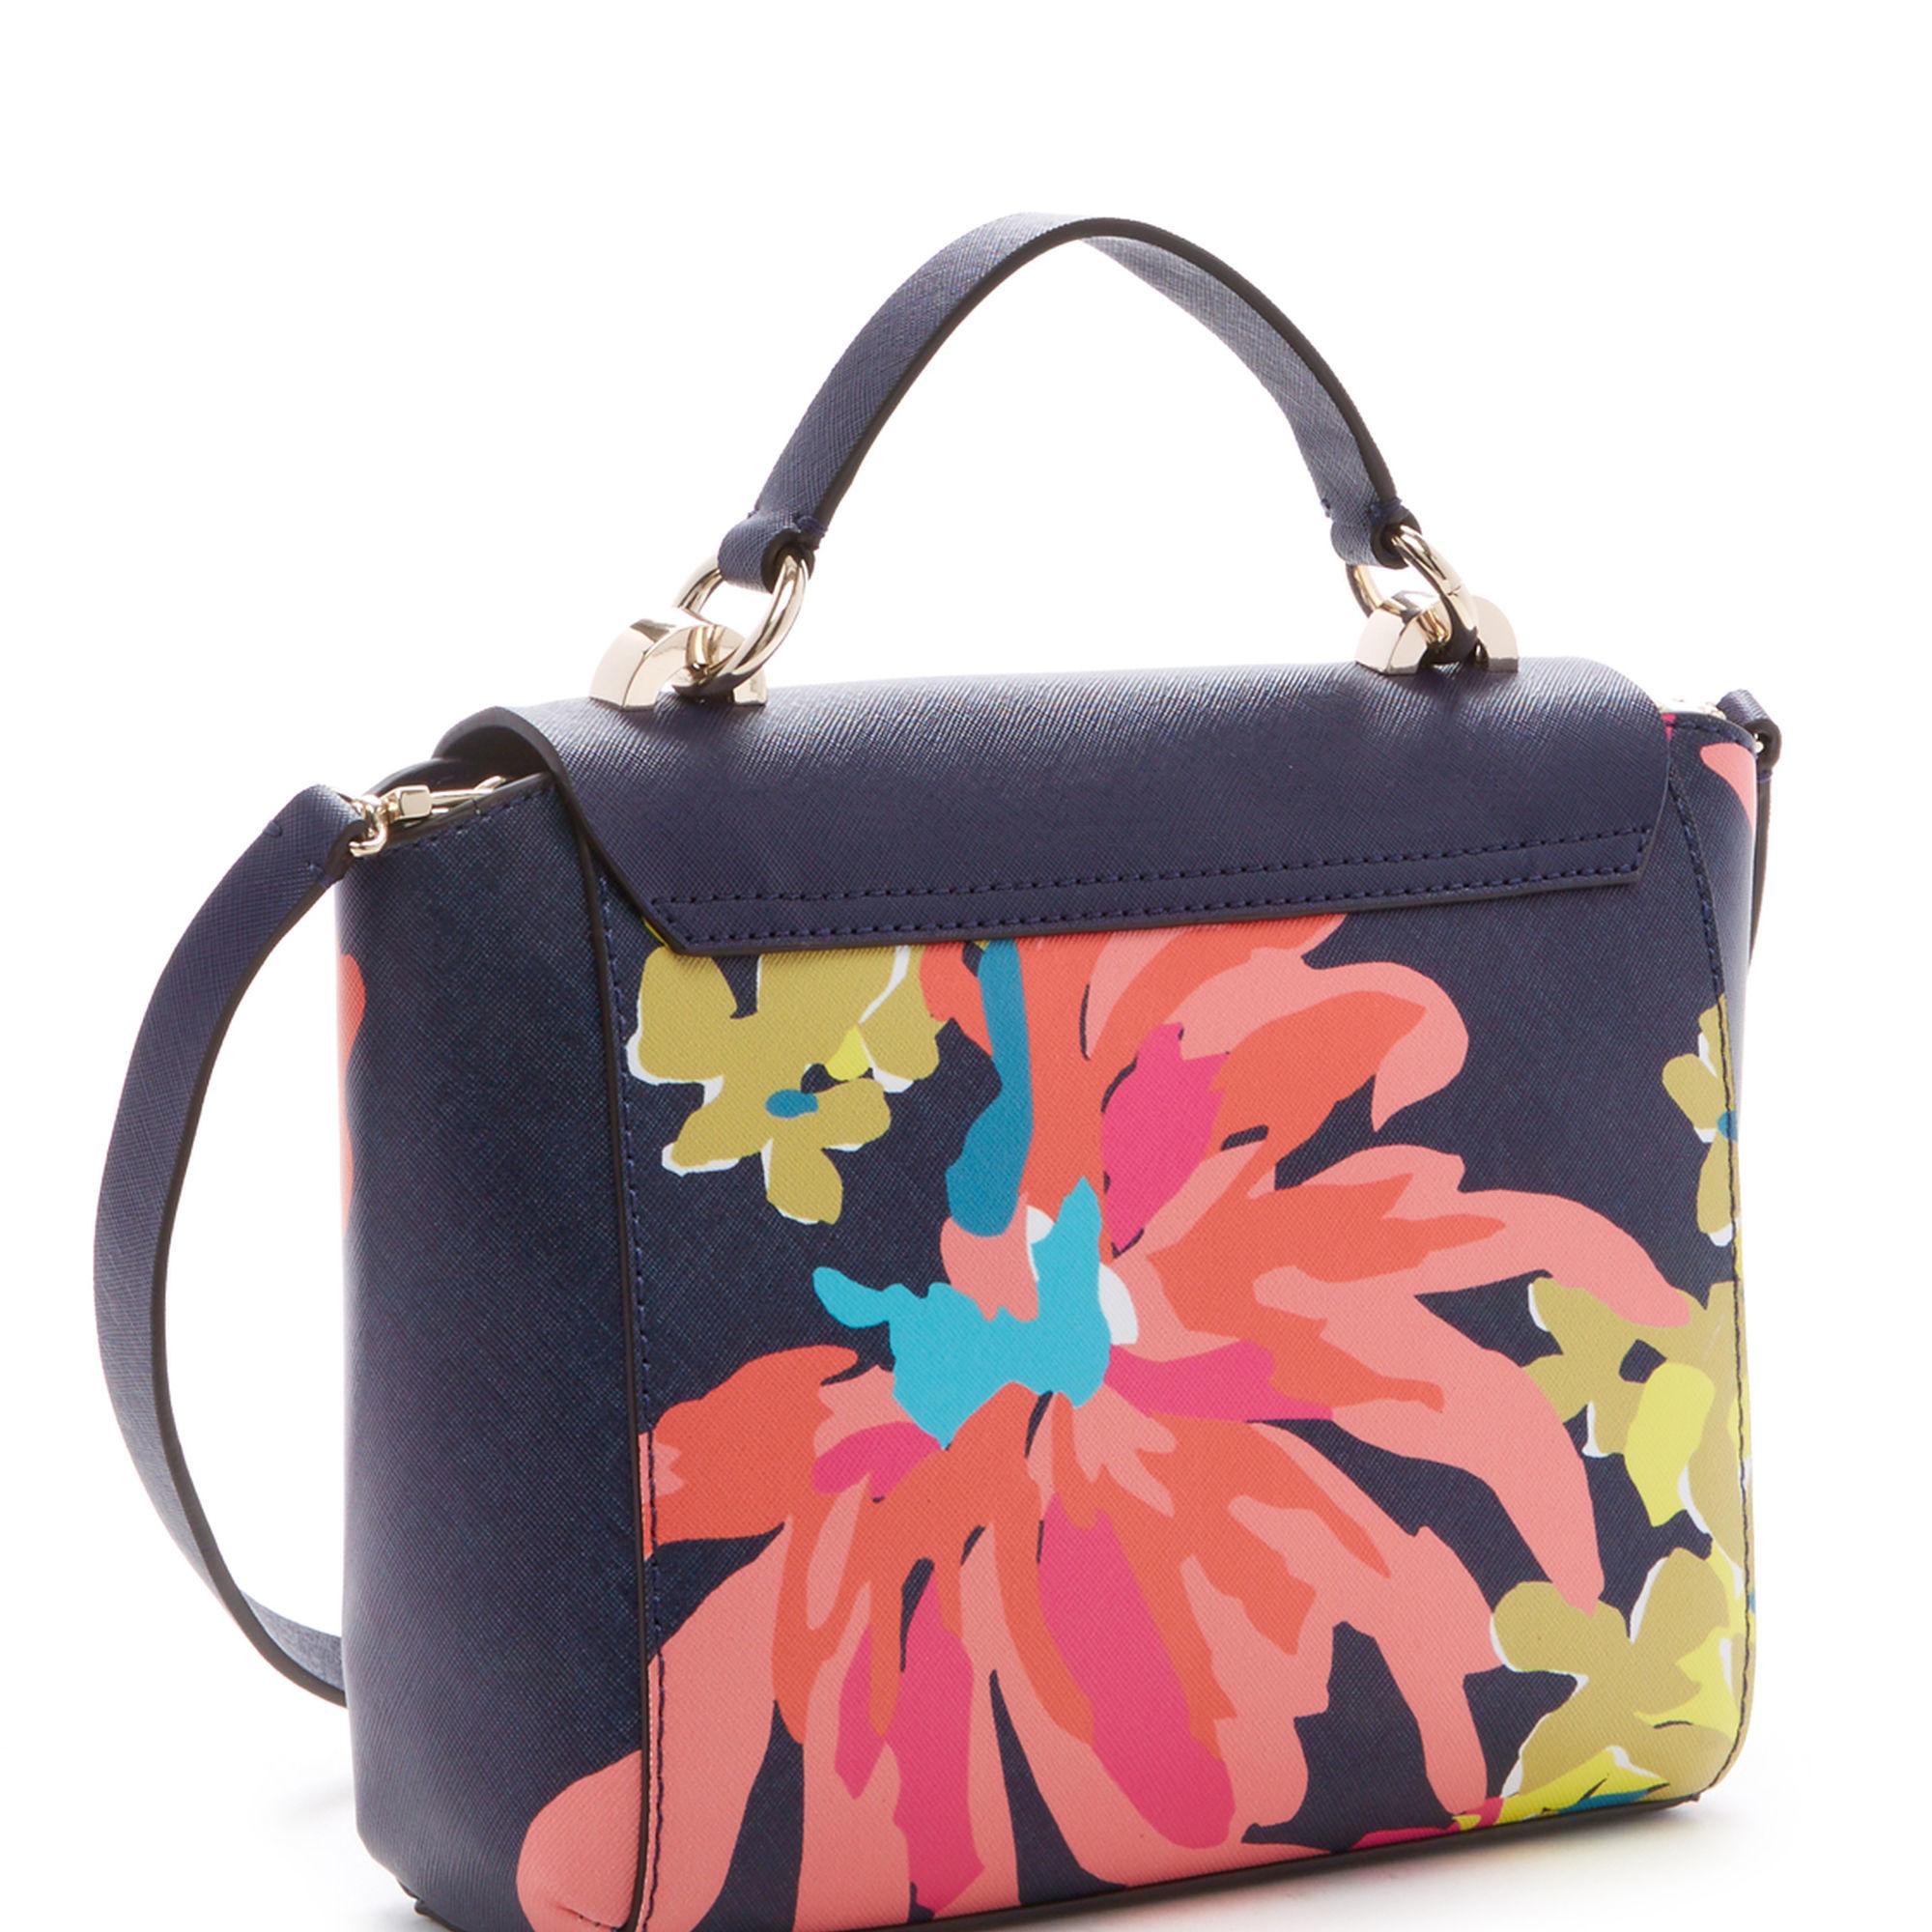 Toulon Top Handle Shoulder Bag